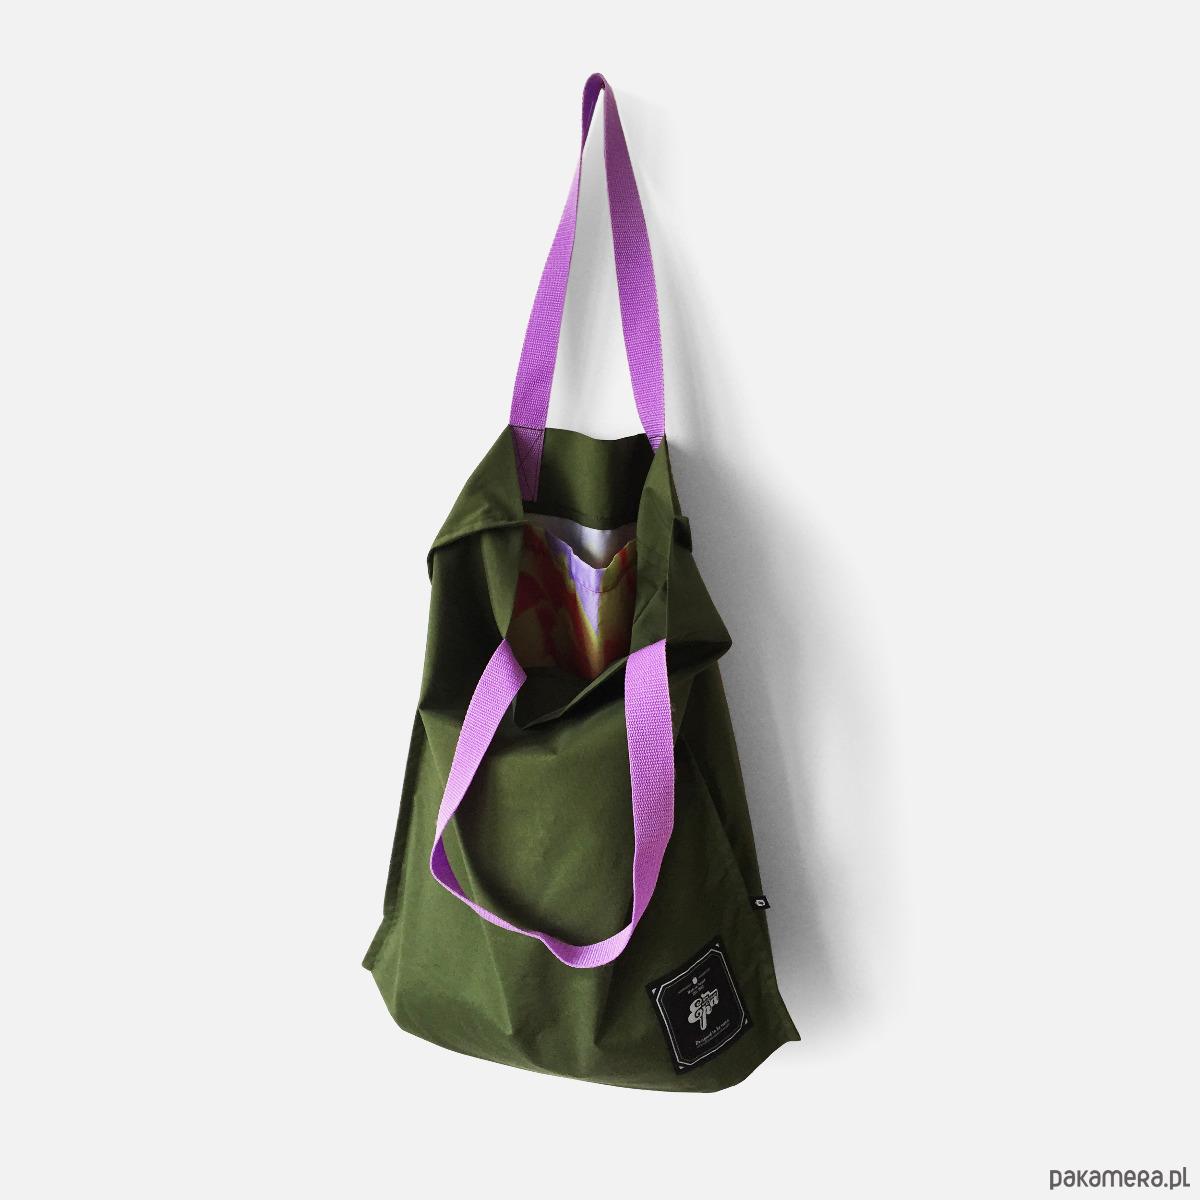 epa model green torby na zakupy unisex. Black Bedroom Furniture Sets. Home Design Ideas